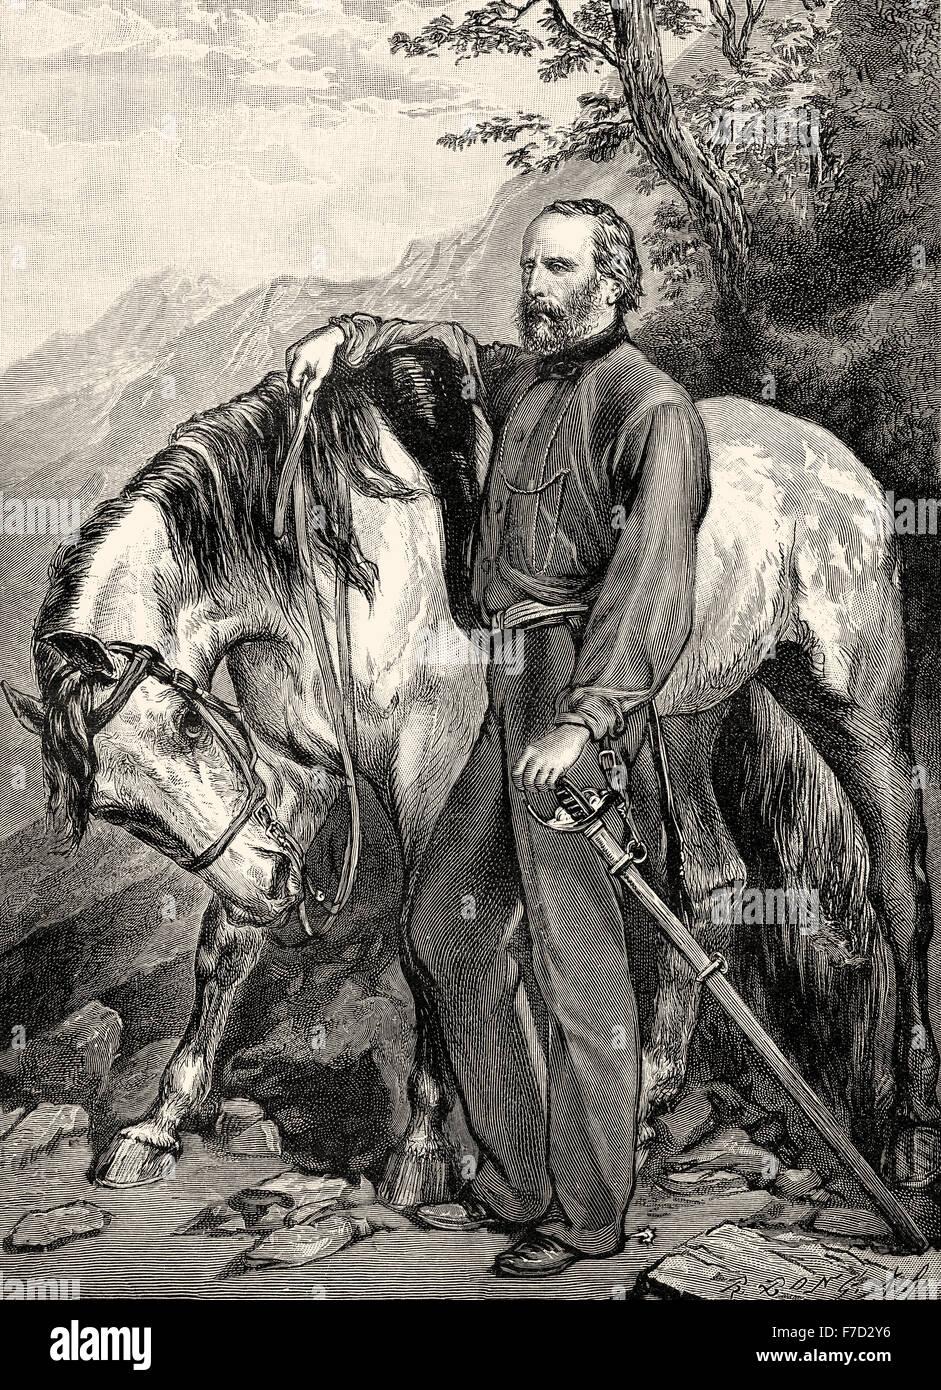 Giuseppe Garibaldi, 1807 - 1882, an Italian guerrilla fighter and protagonist of the Risorgimento, - Stock Image